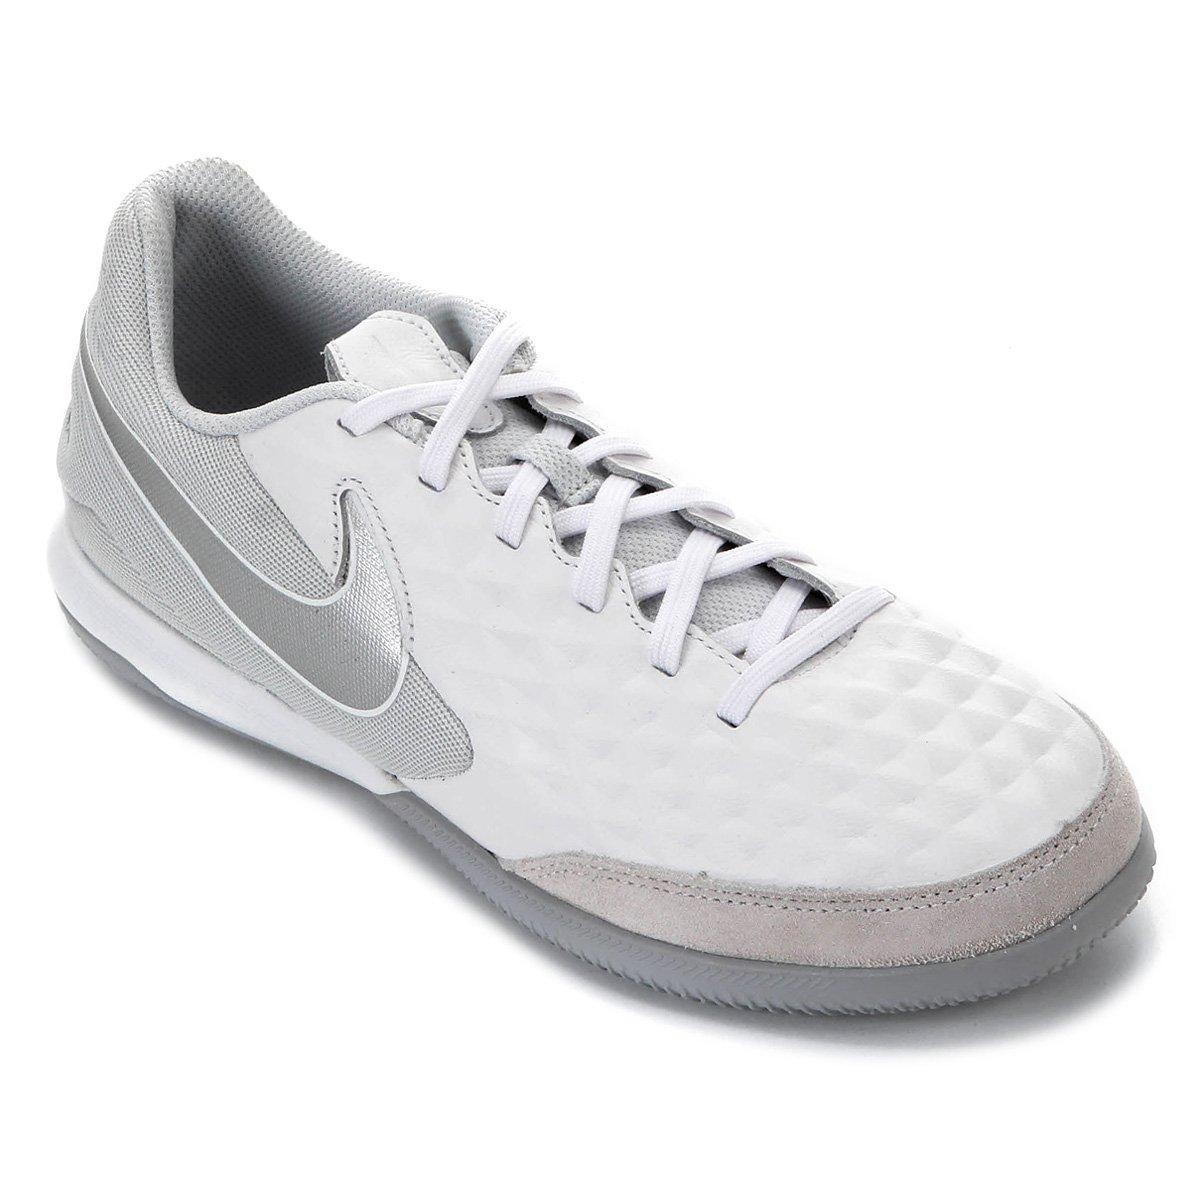 Chuteira Nike Tiempo Legend 8